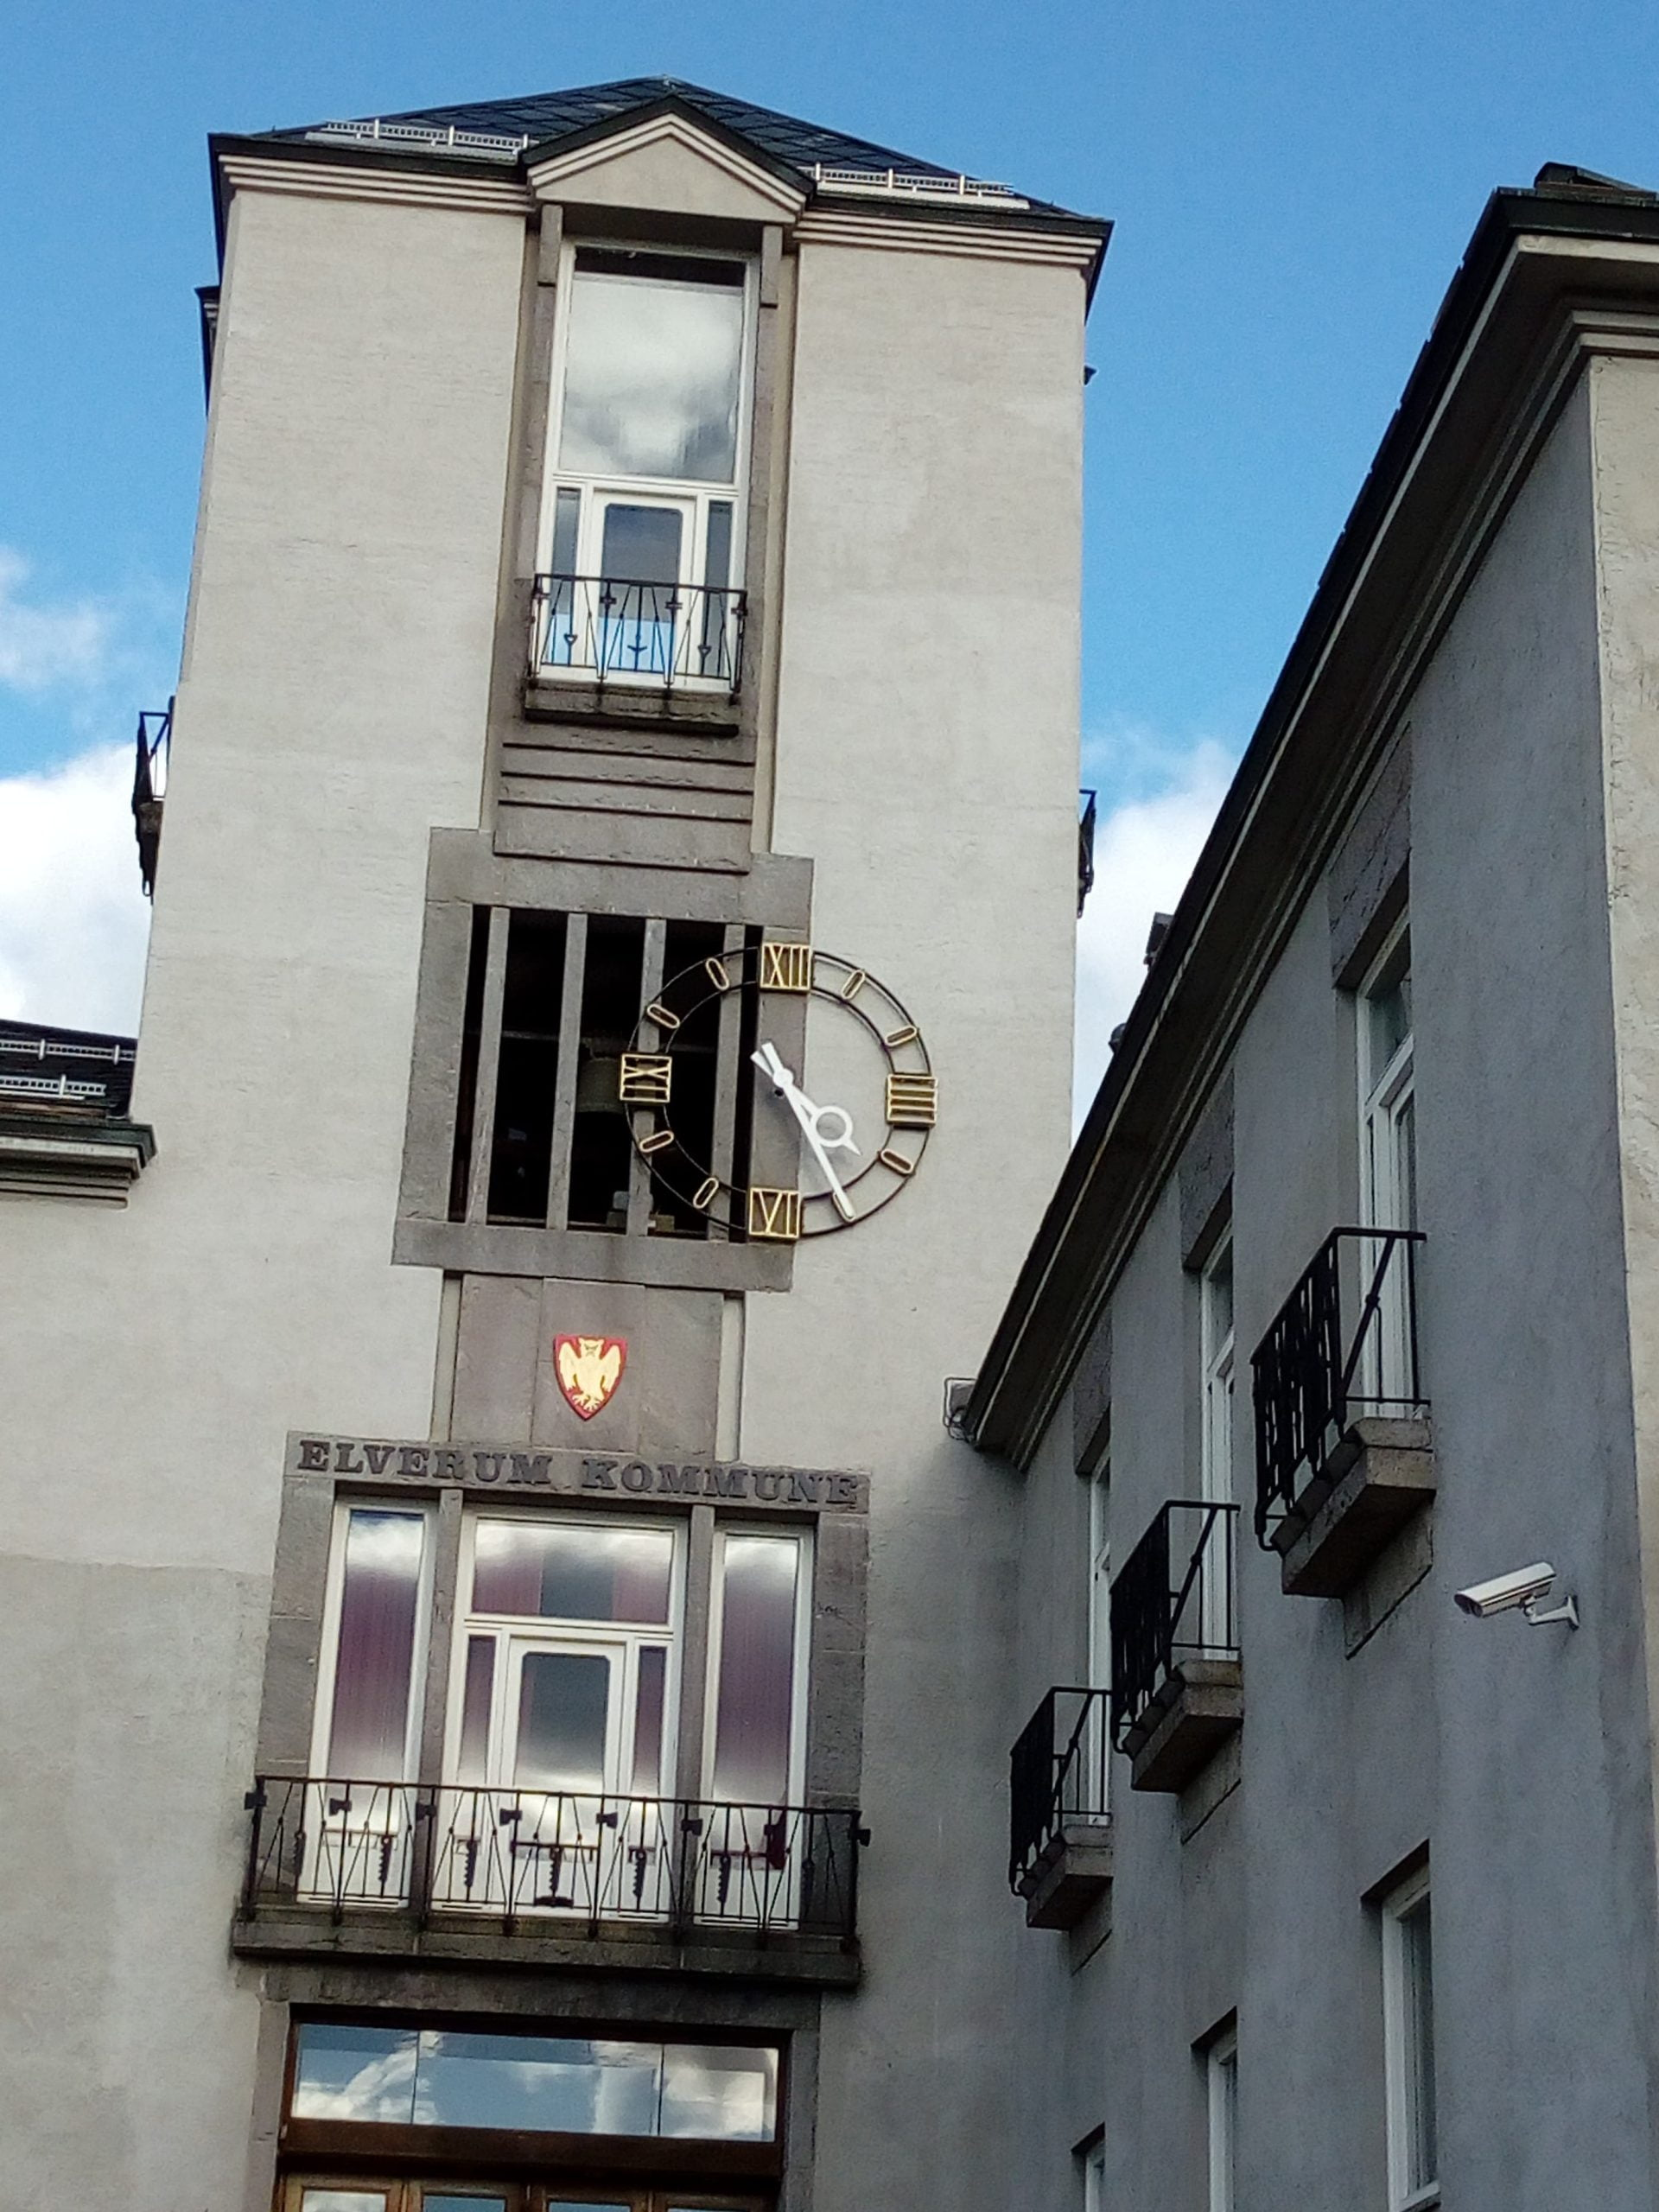 Rådhuset Elverum fasadeur